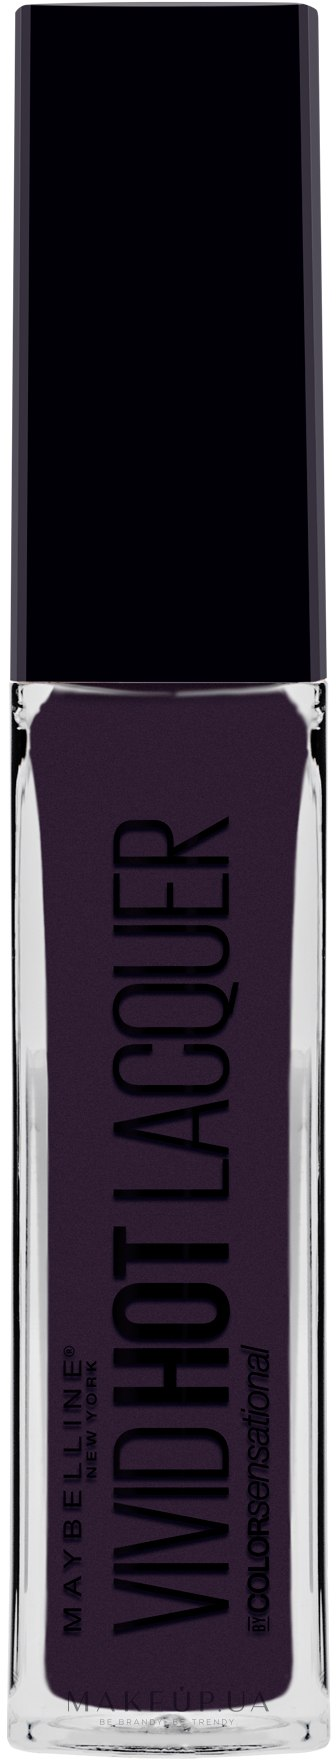 Блеск для губ - Maybelline Color Sensational Vivid Hot Lacquer Lippenstift — фото 82 - Slay It